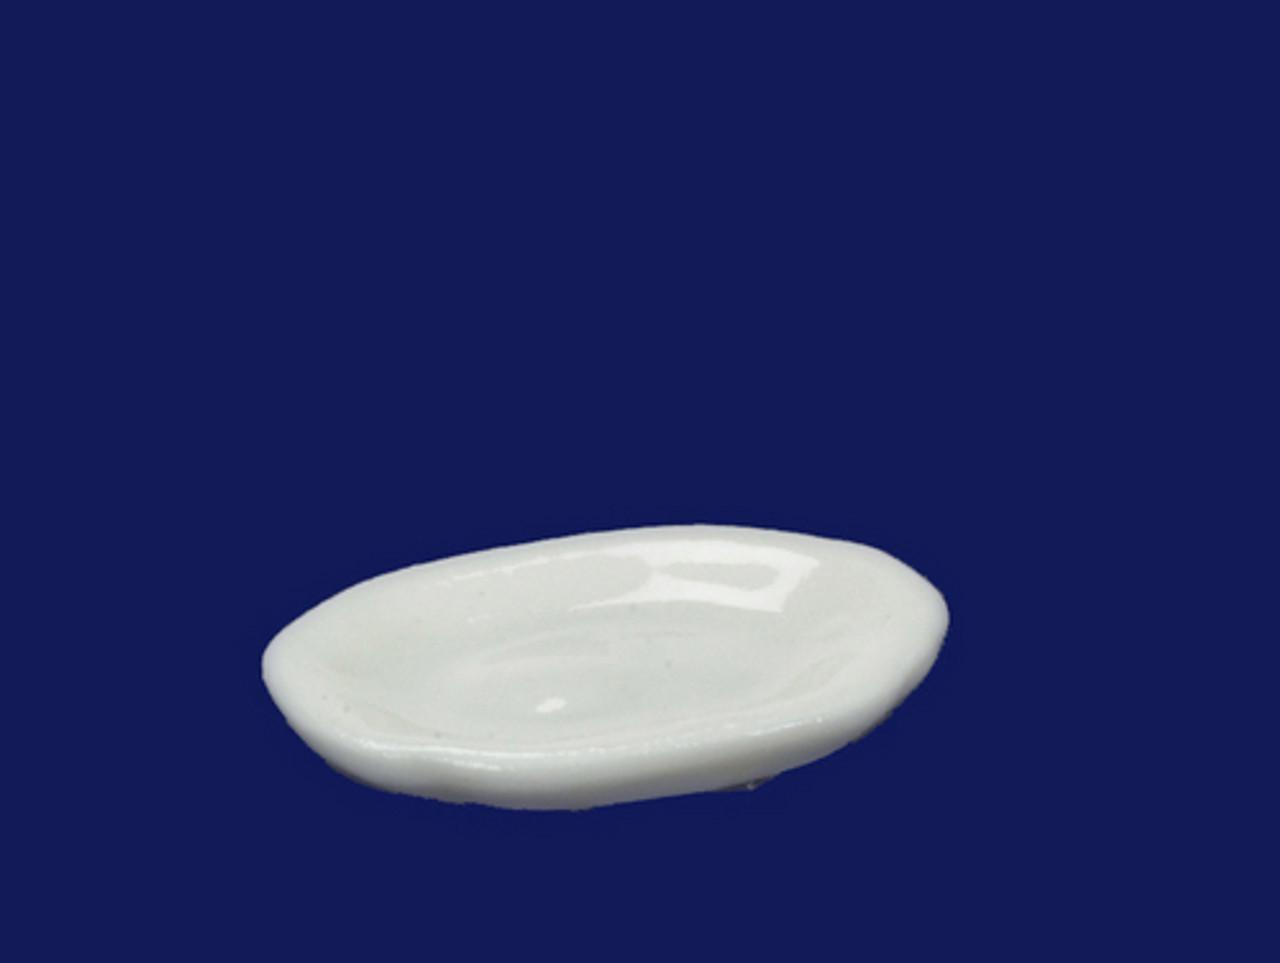 Dinner Plate - Octagon